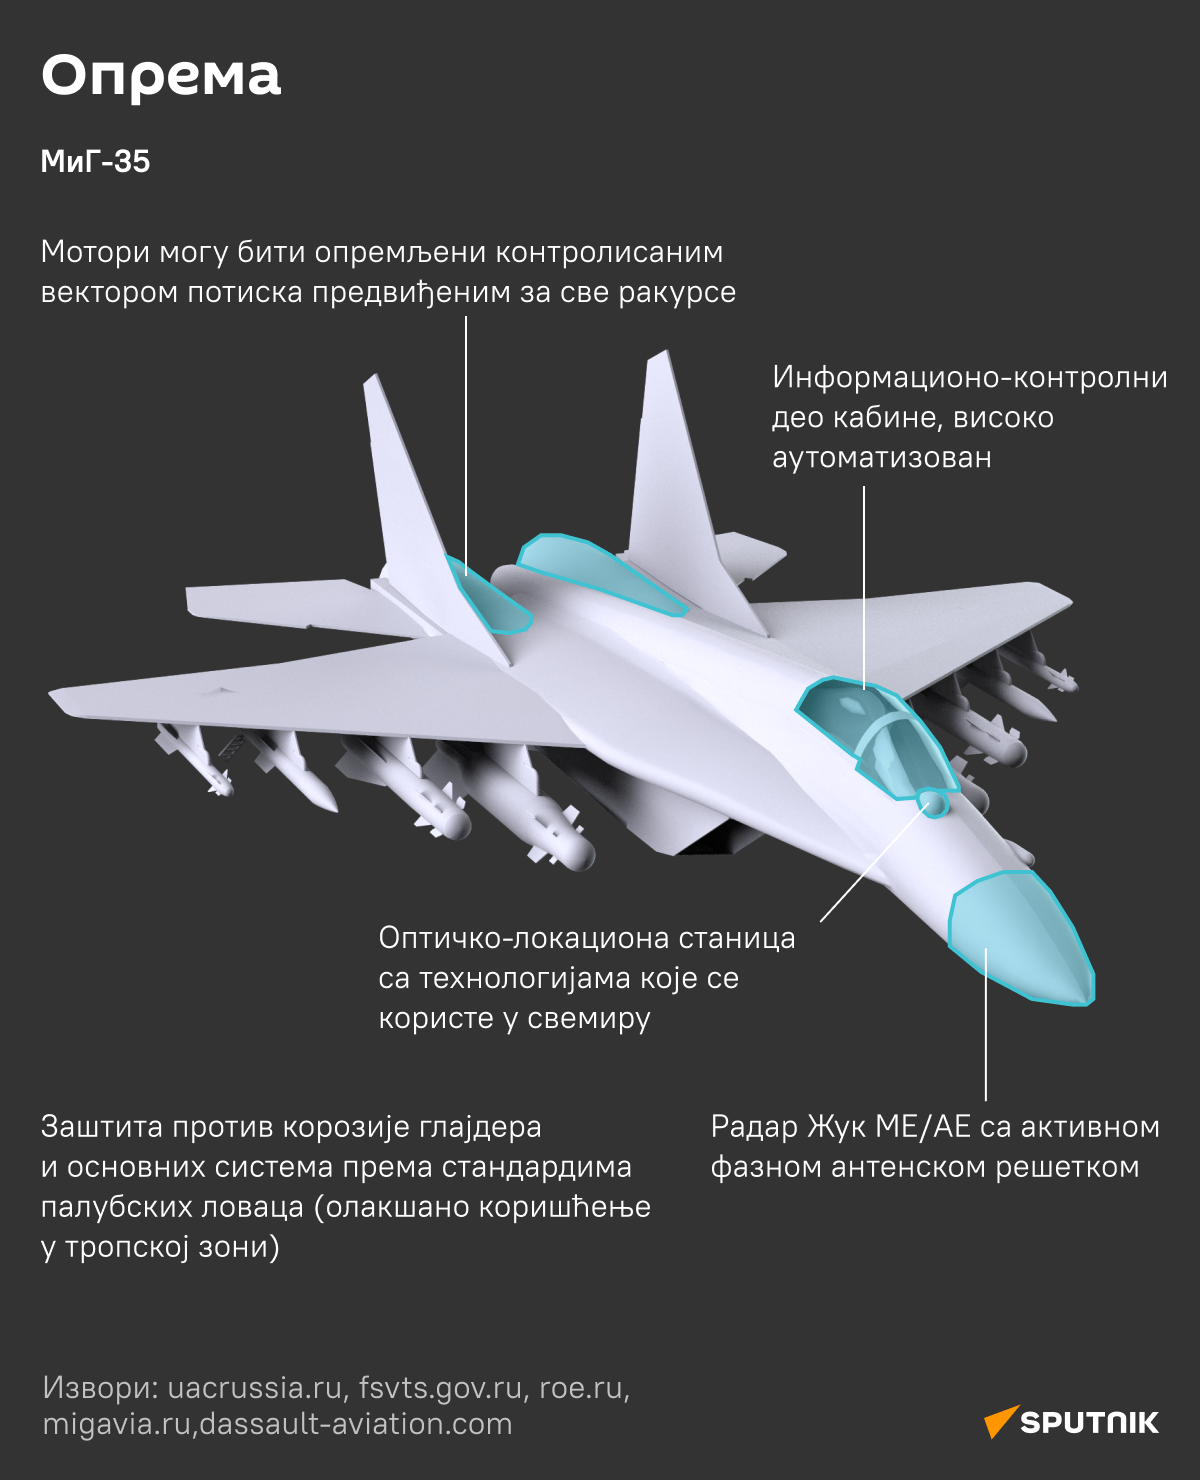 Rafal vs MiG 5 - Sputnik Srbija